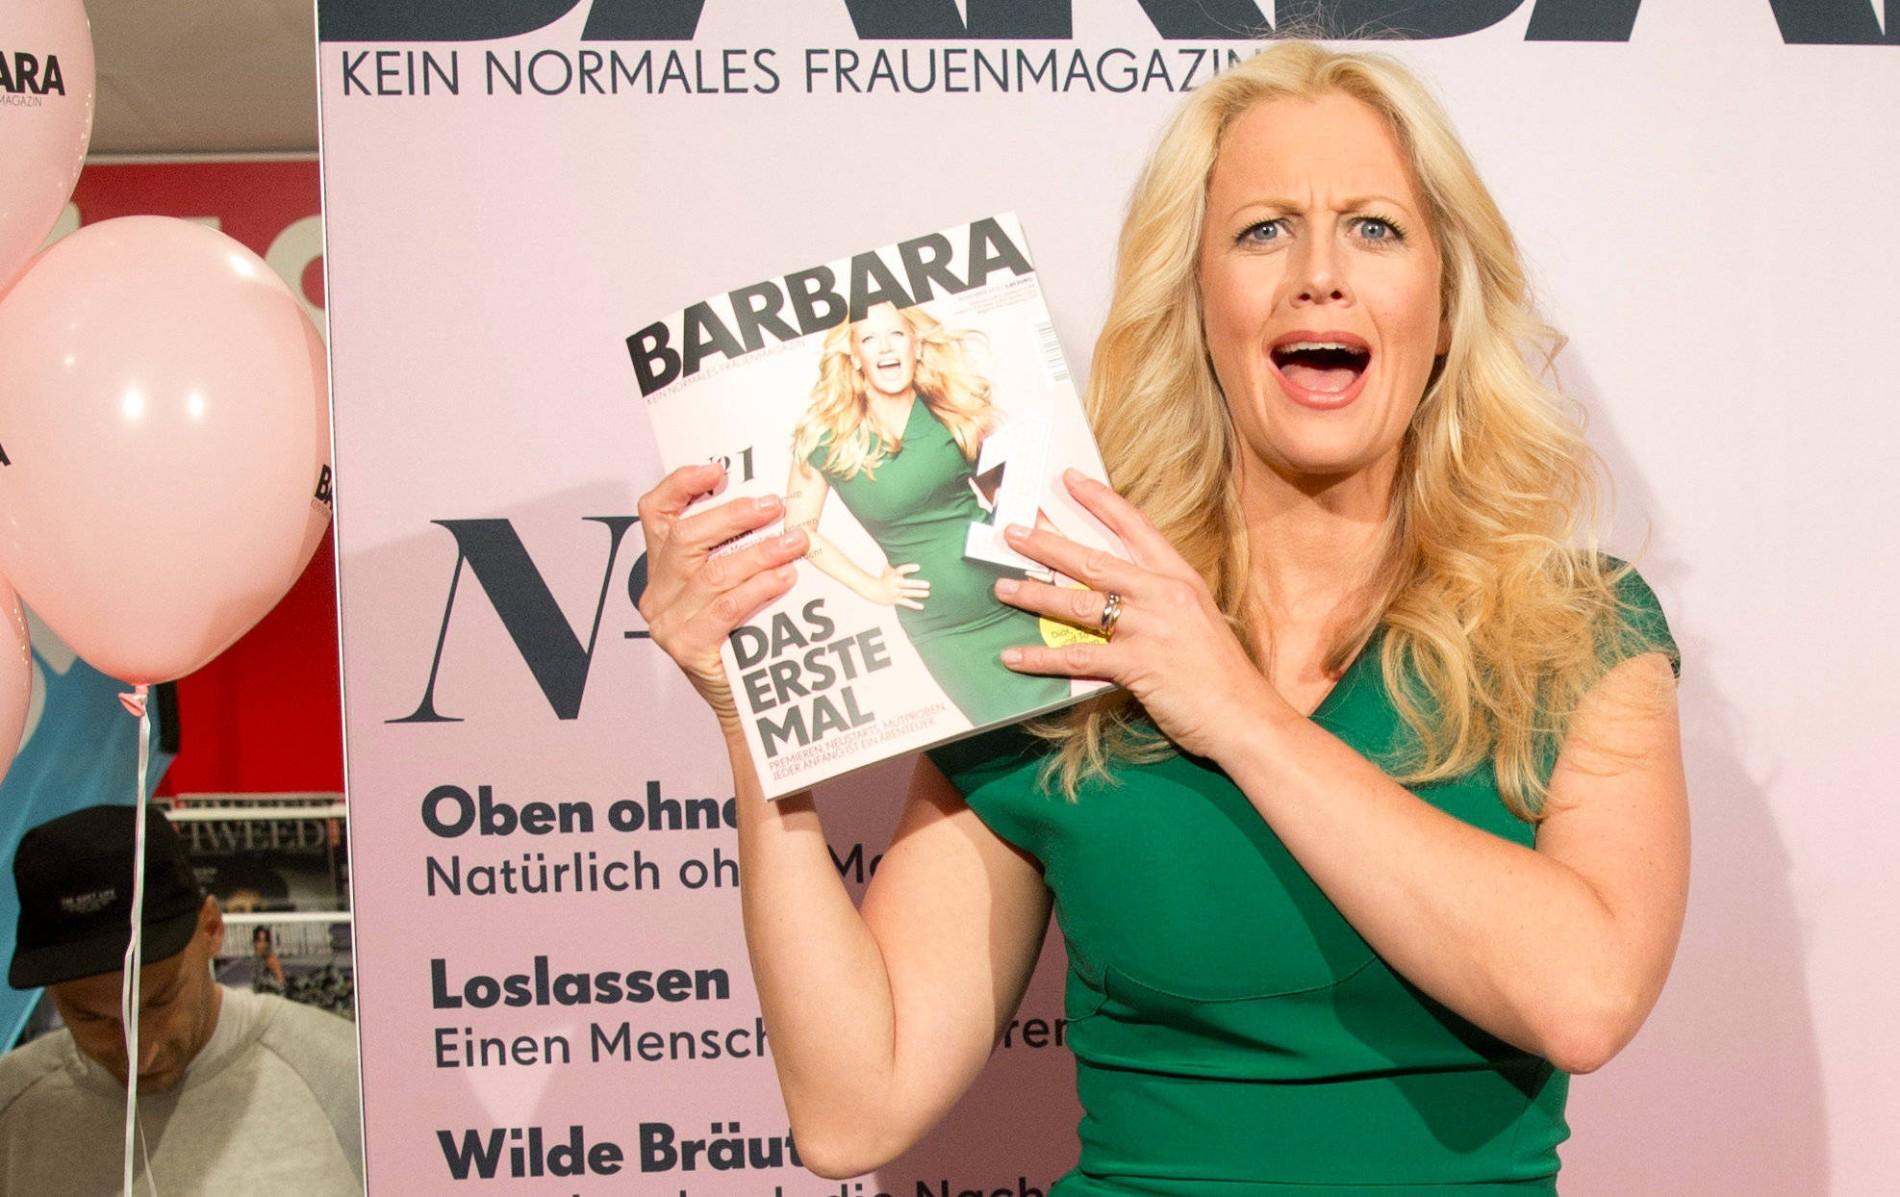 Schöneberg brust barbara Barbara Schöneberger: